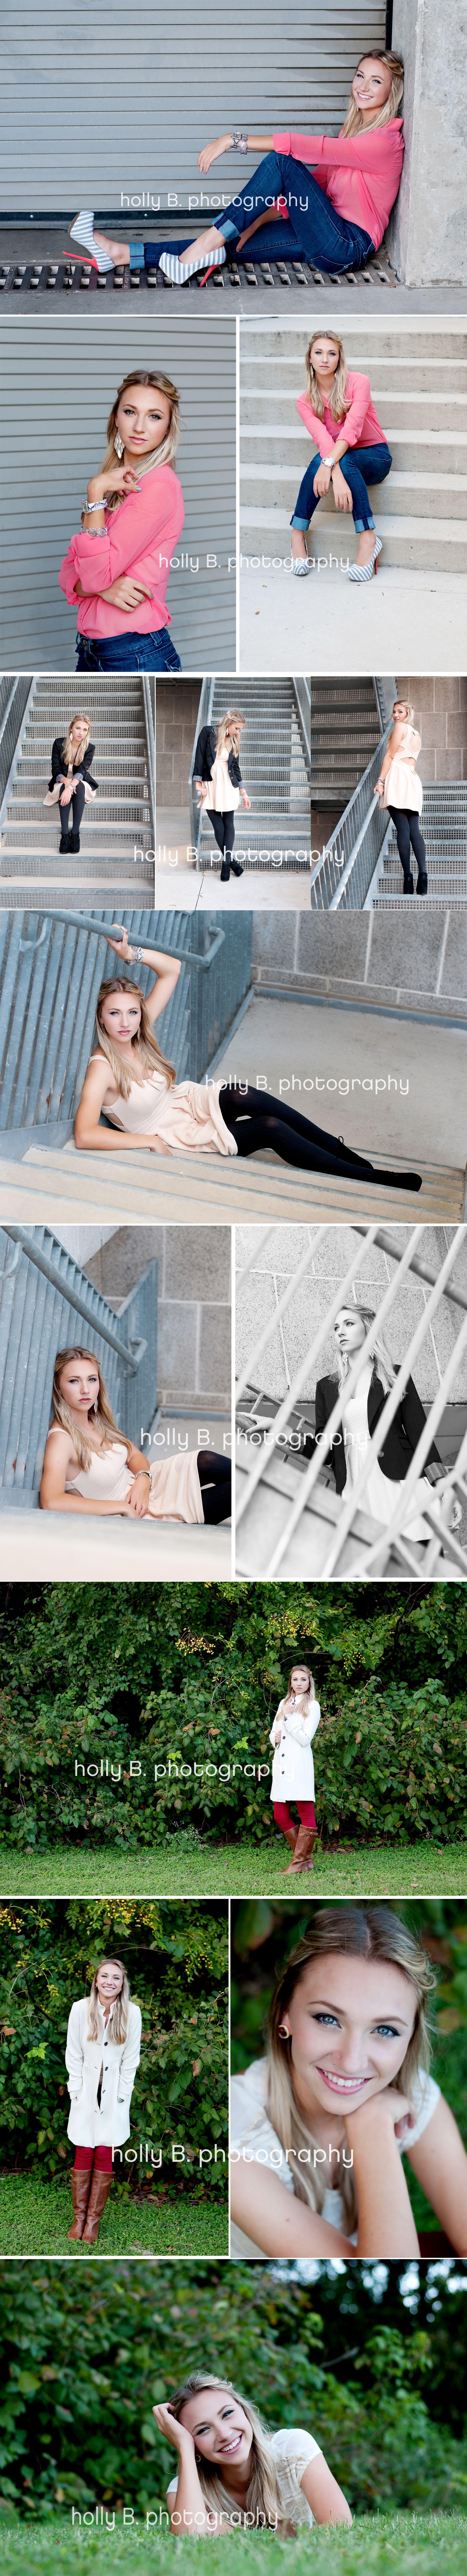 senior portraits, senior posing, senior girl posing, urban senior photos